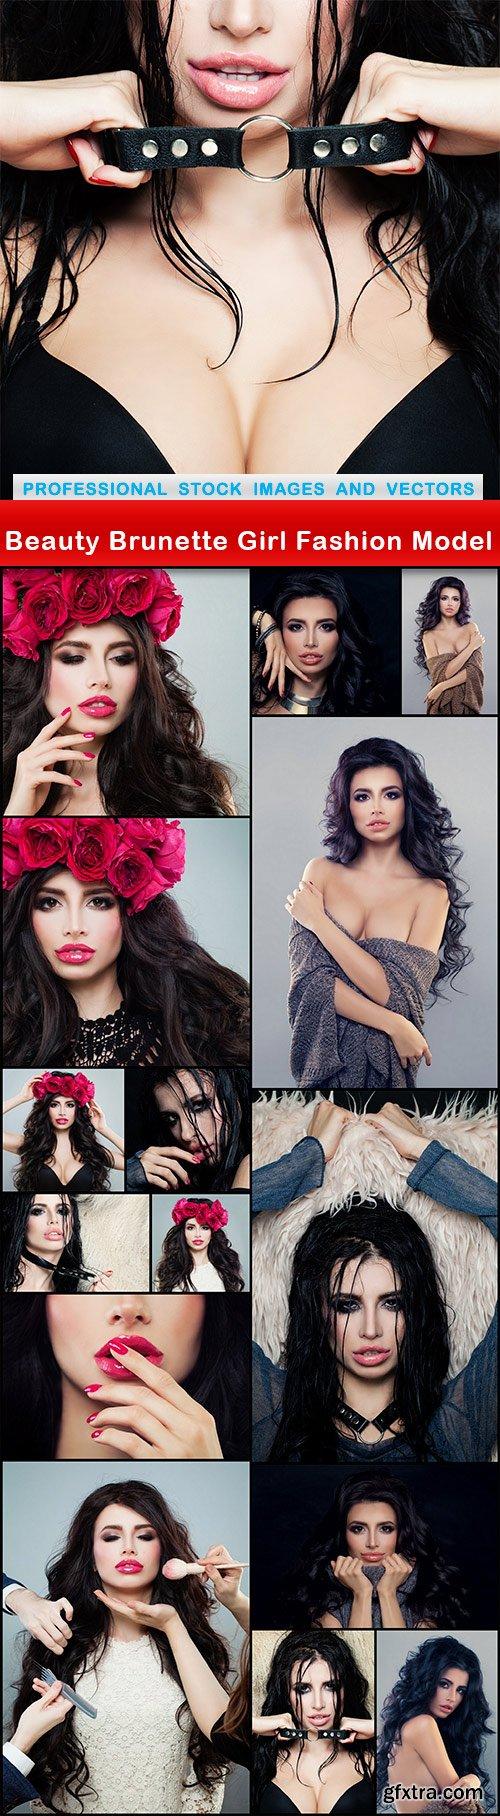 Beauty Brunette Girl Fashion Model - 16 UHQ JPEG